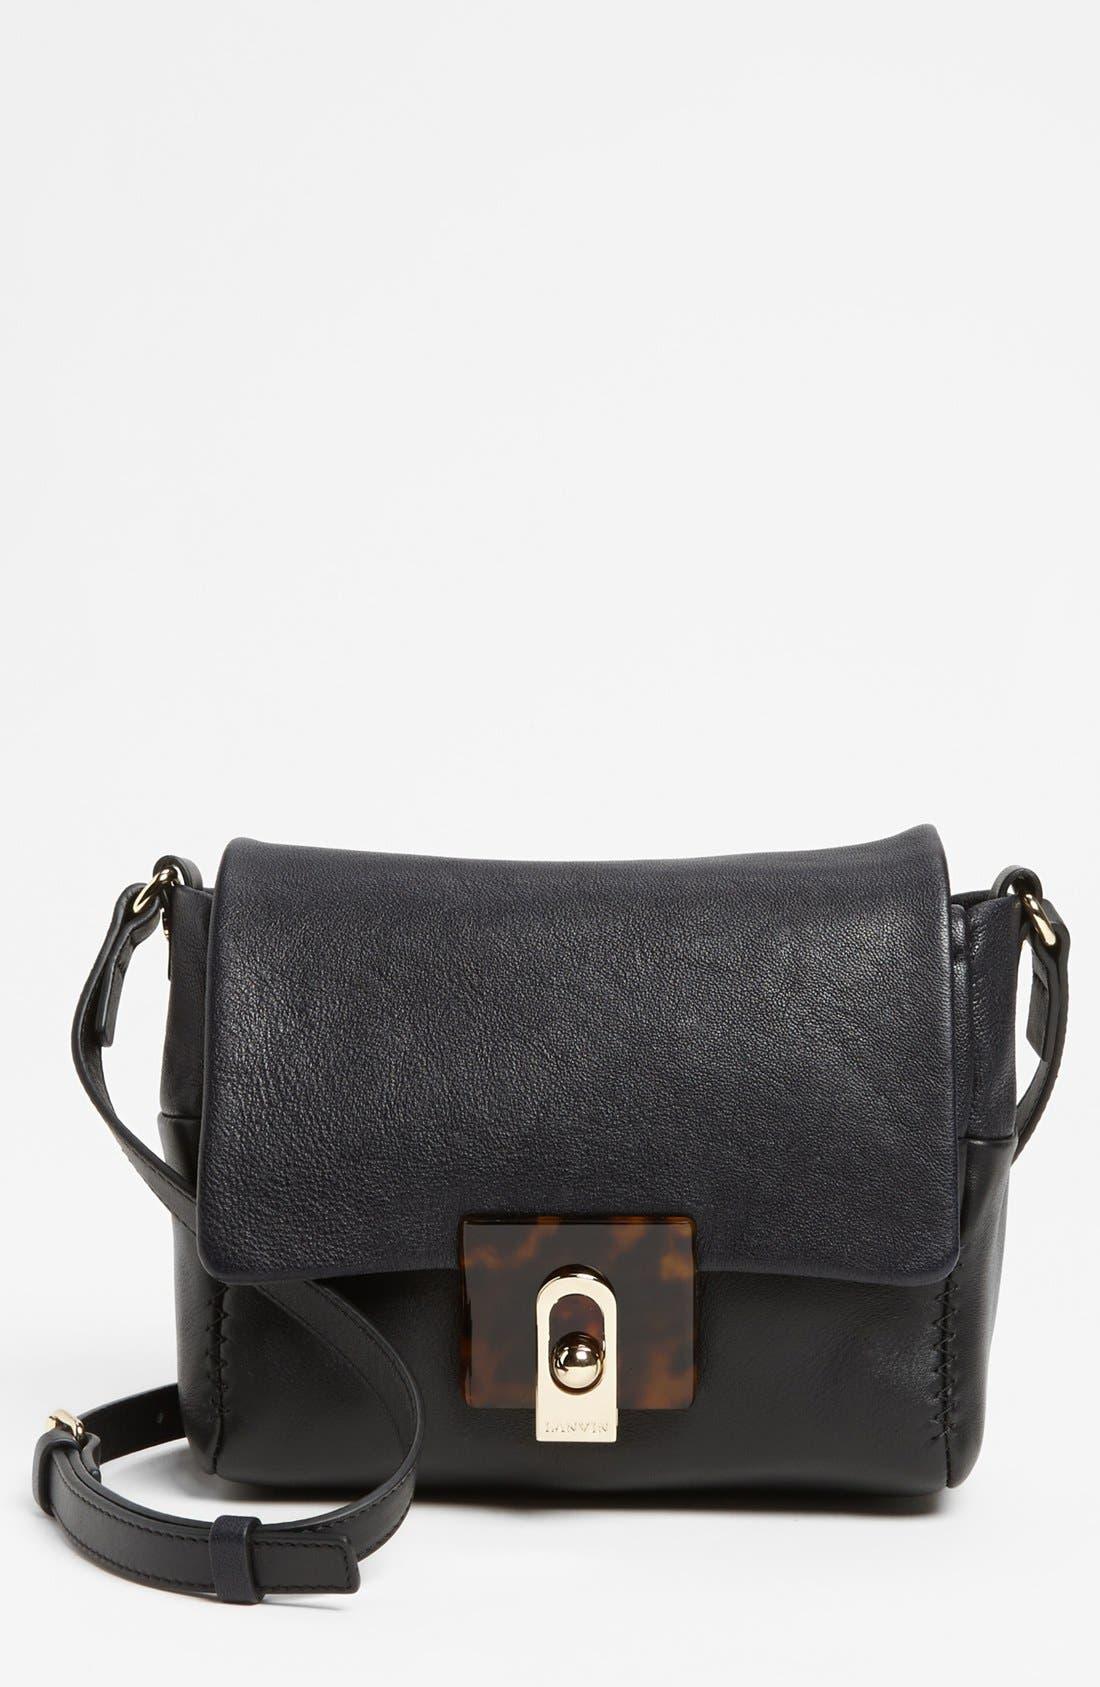 Alternate Image 1 Selected - Lanvin 'For Me' Leather Crossbody Bag